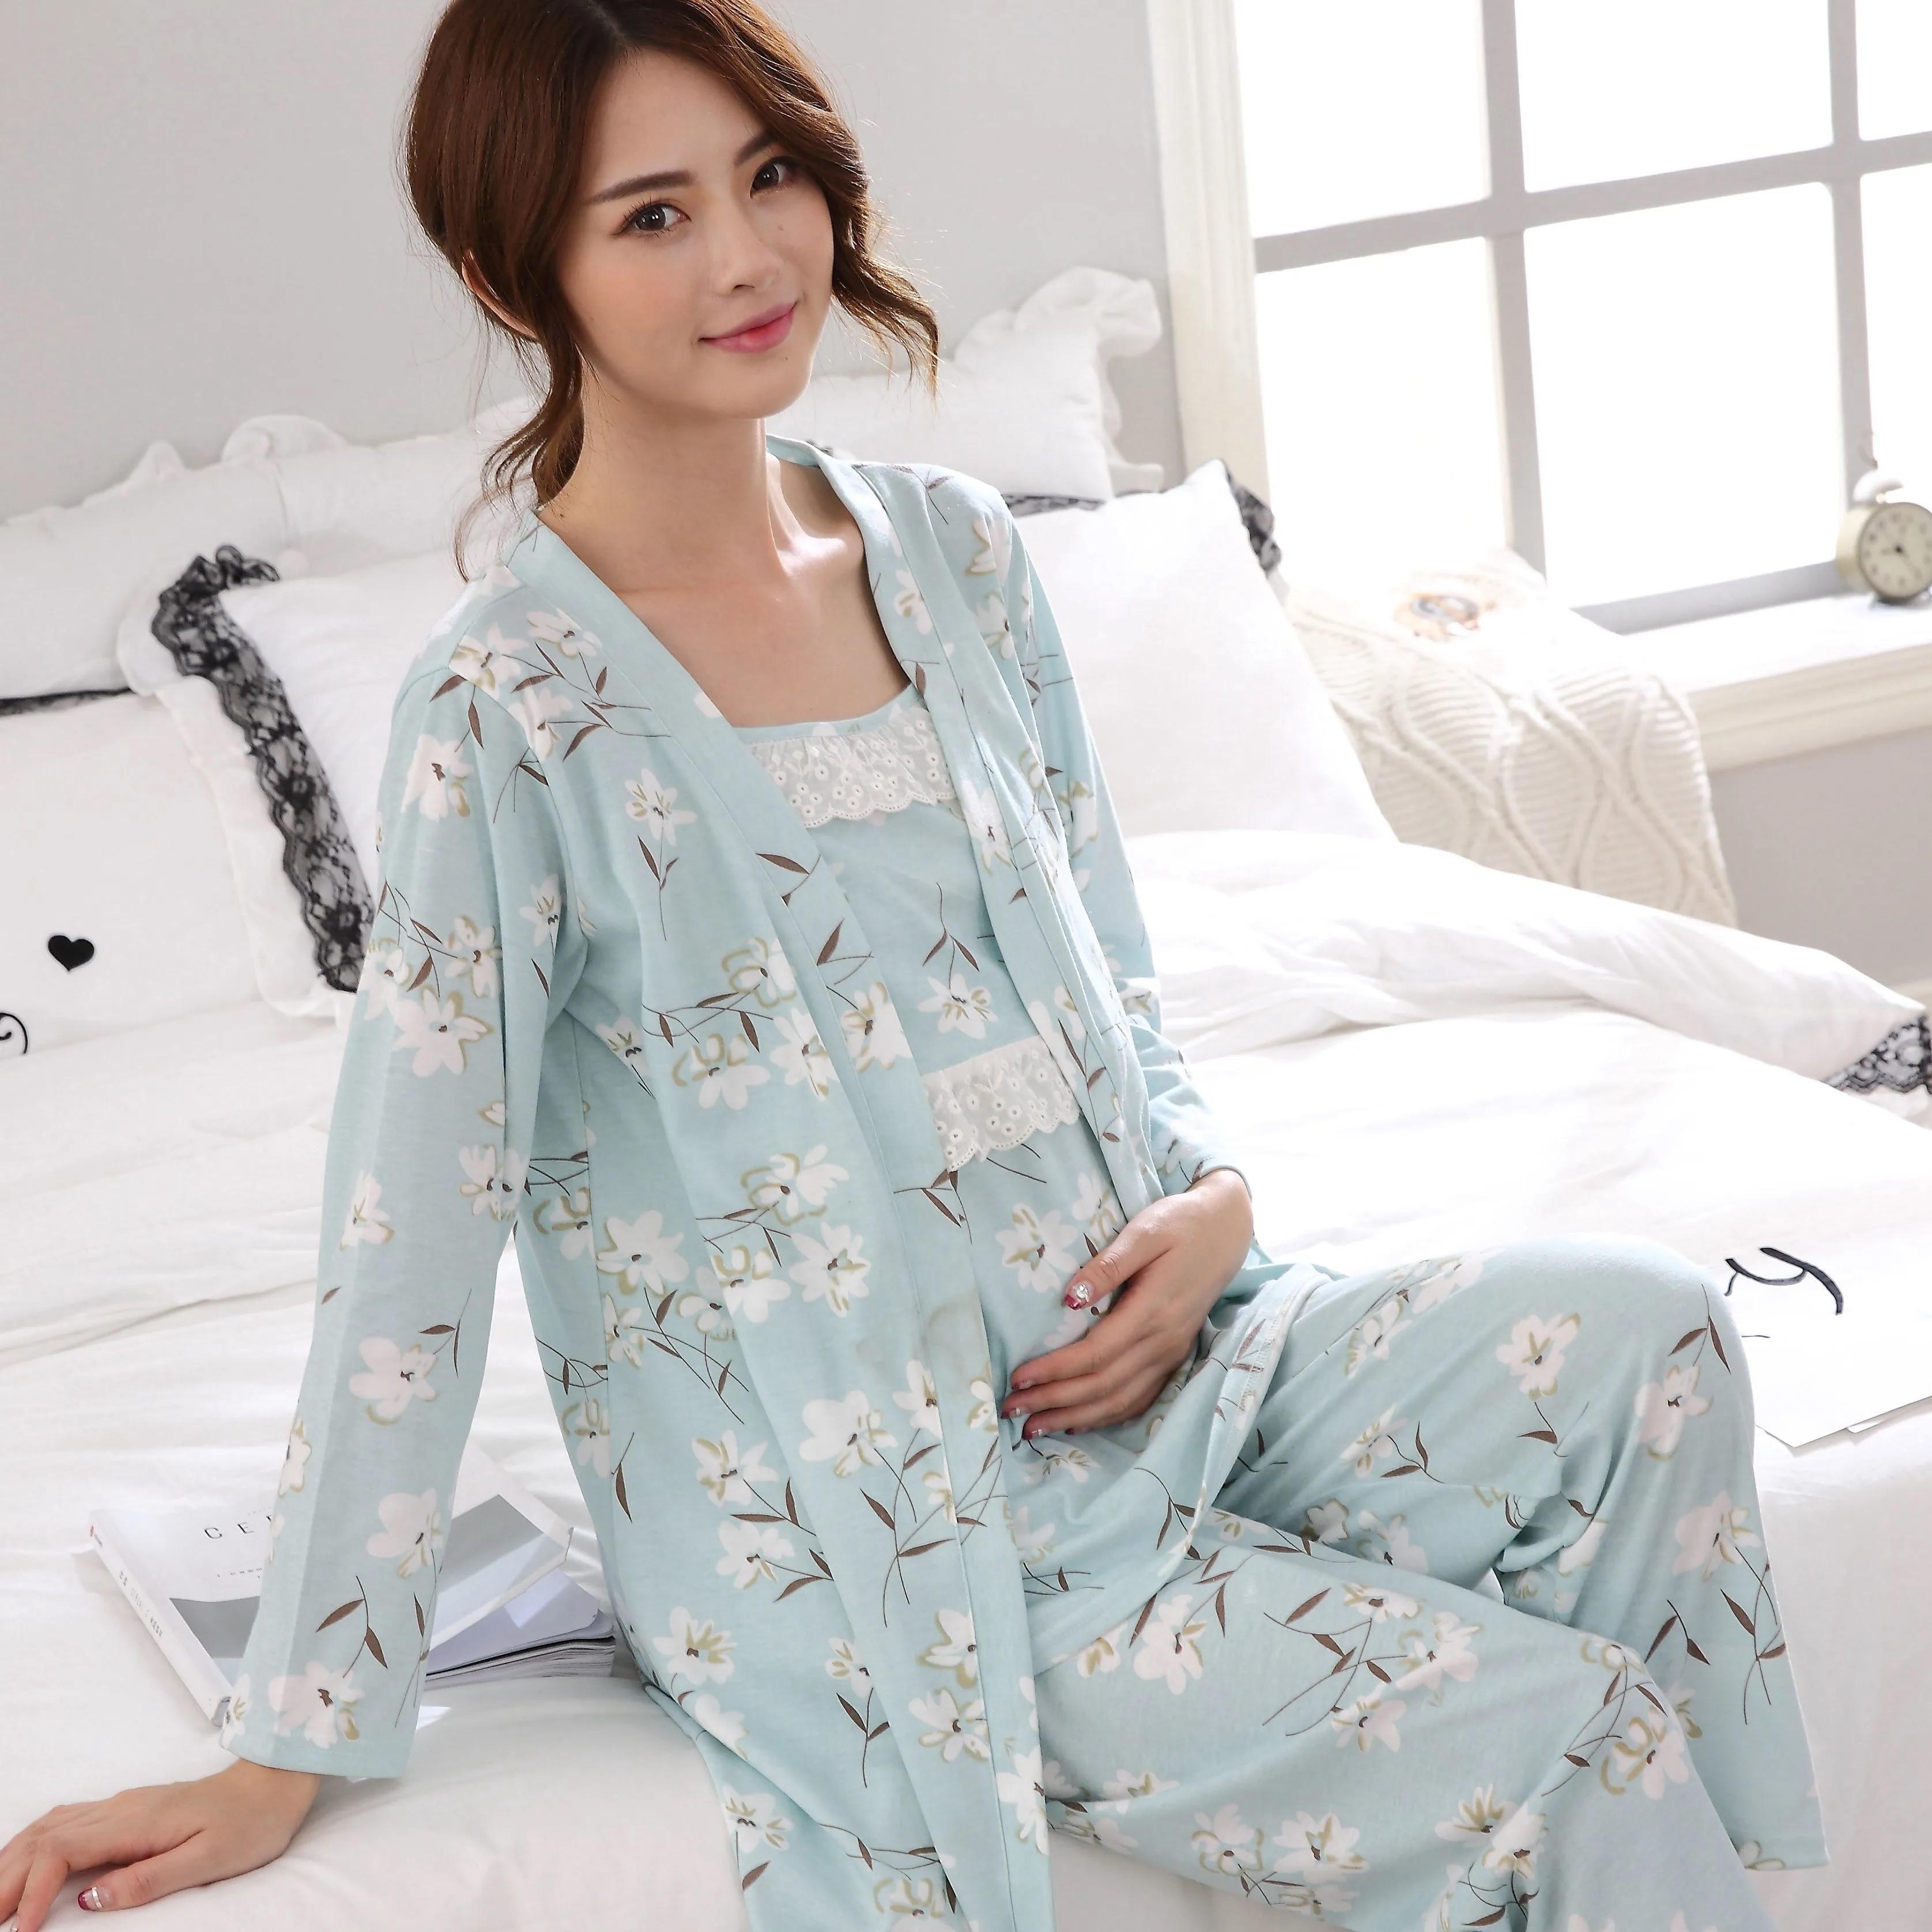 3pcs/Set Cotton Postpartum Pregnant Women Breastfeeding Suit Long-sleeved Pajamas Home Clothes Delivery Maternity Nursing Tank enlarge